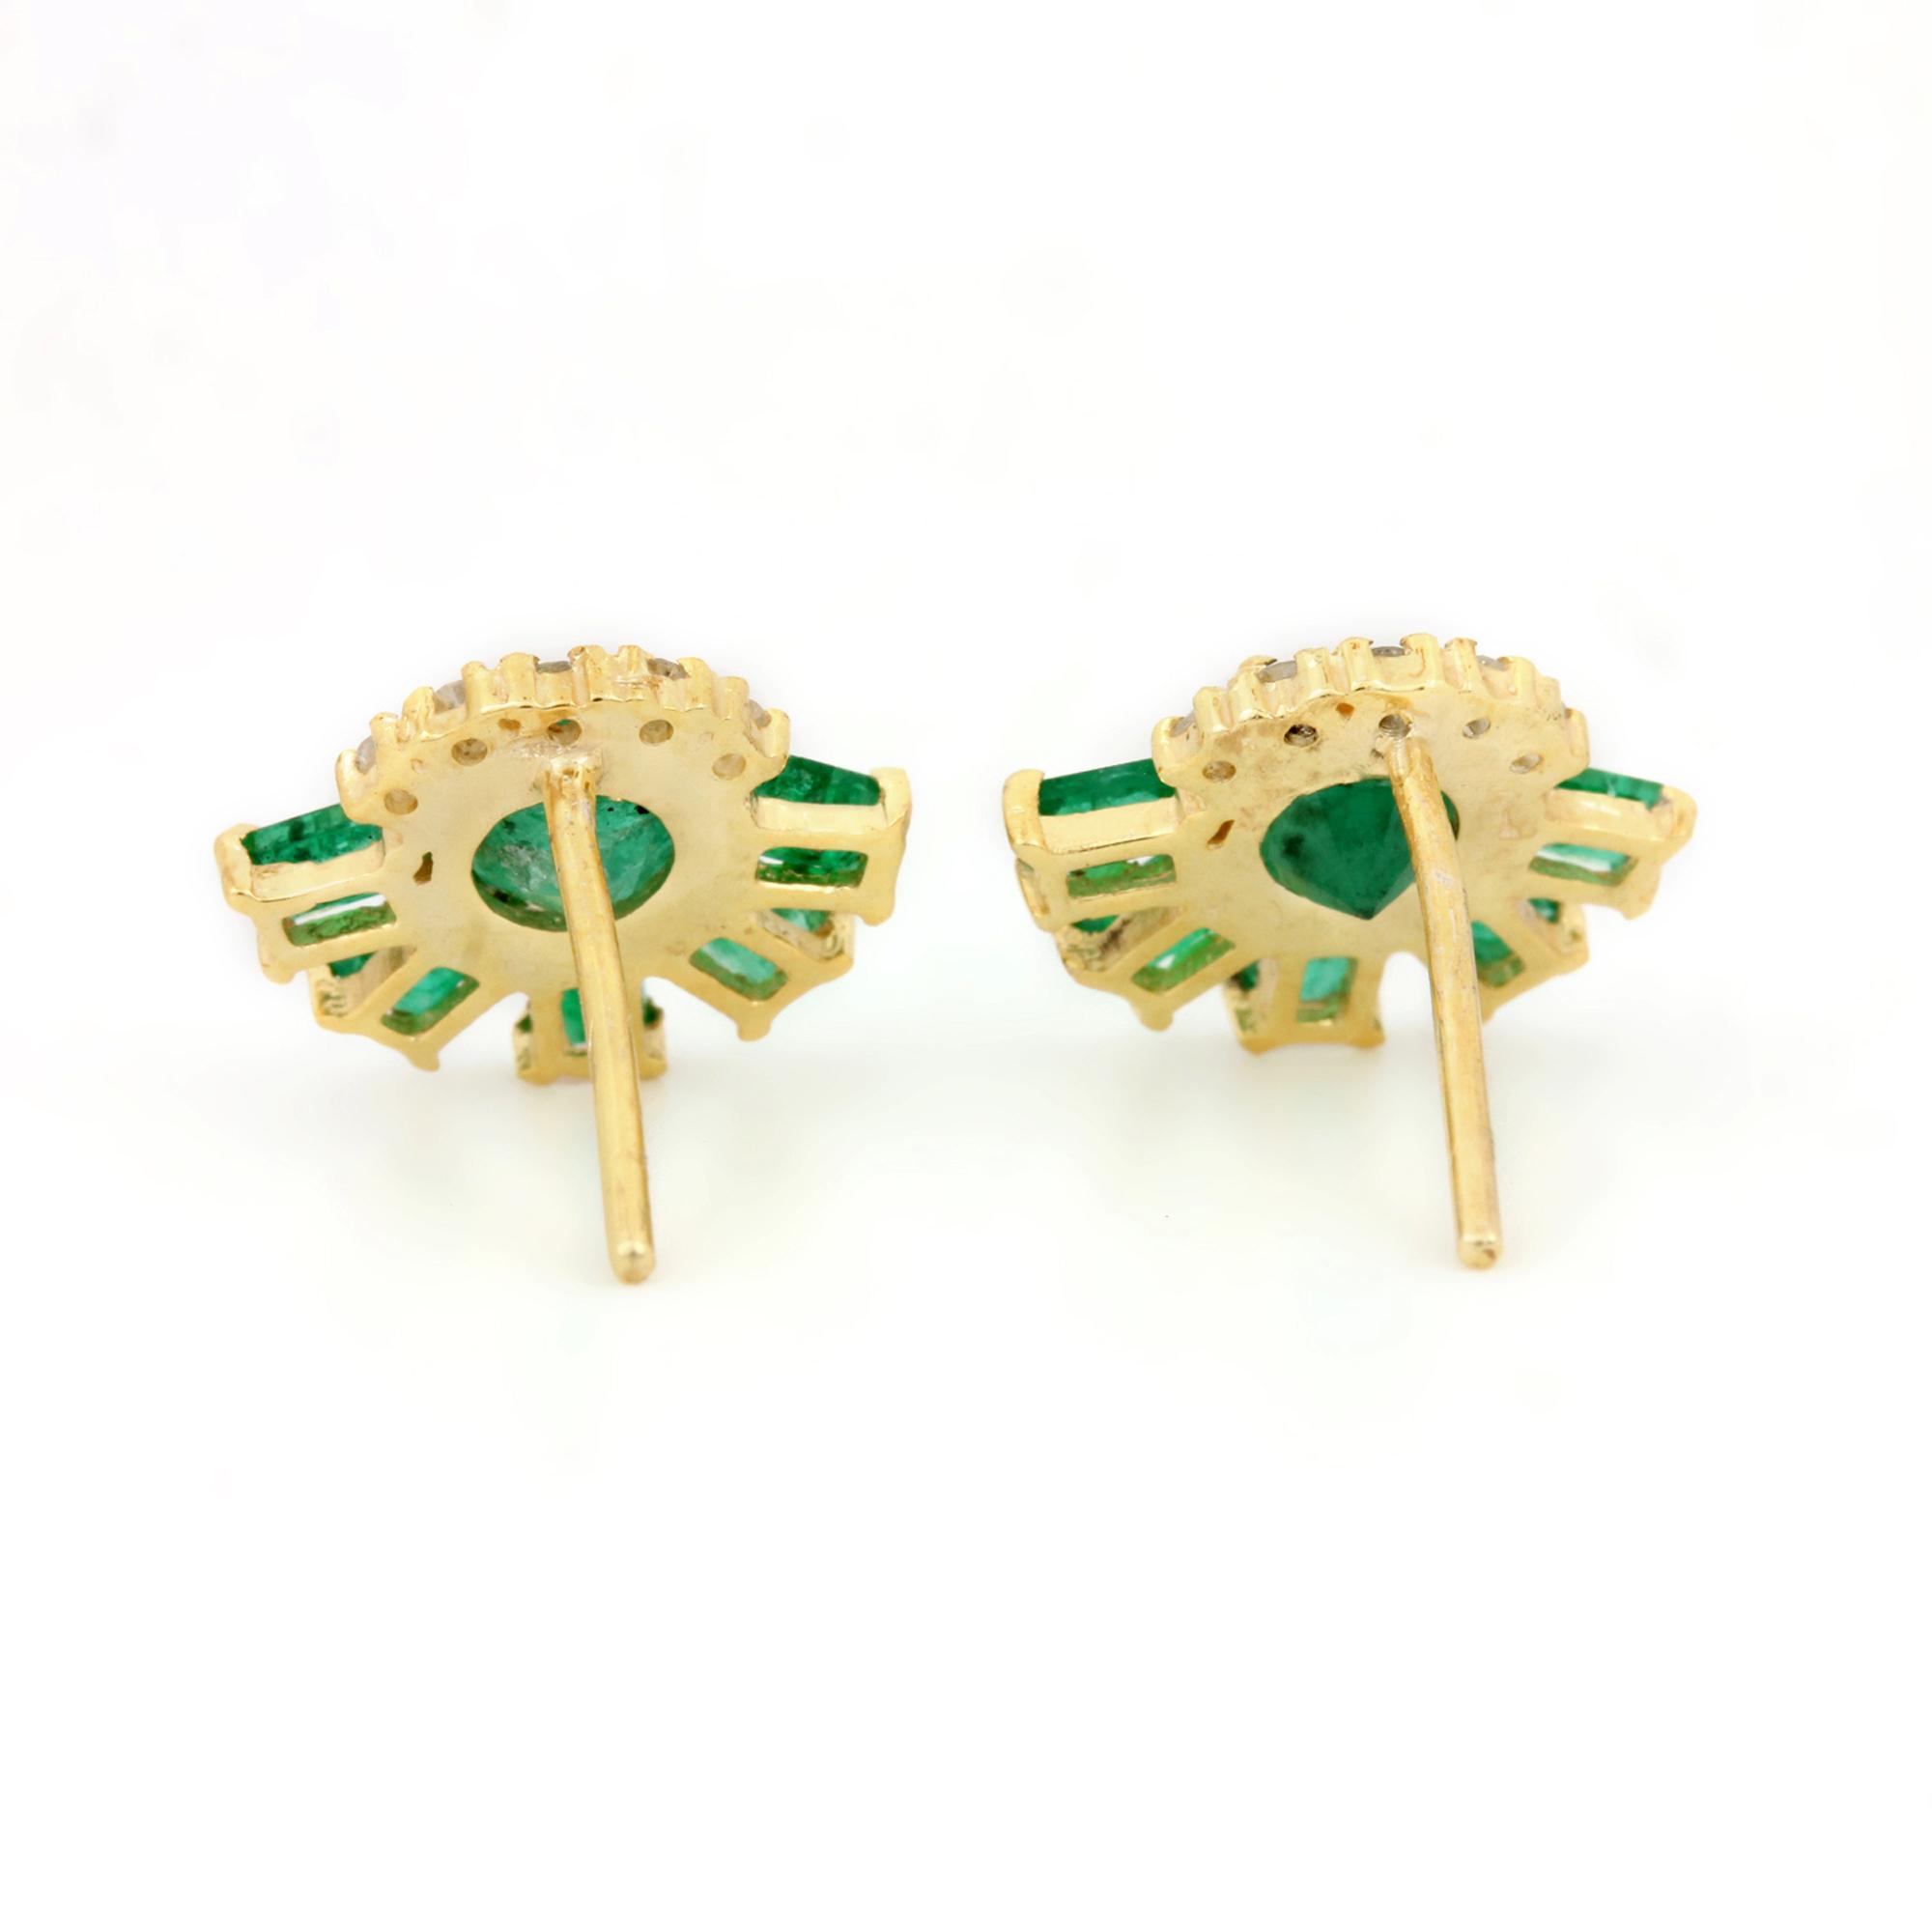 Genuine Diamond 14k Solid Gold Emerald Floral Stud Earrings